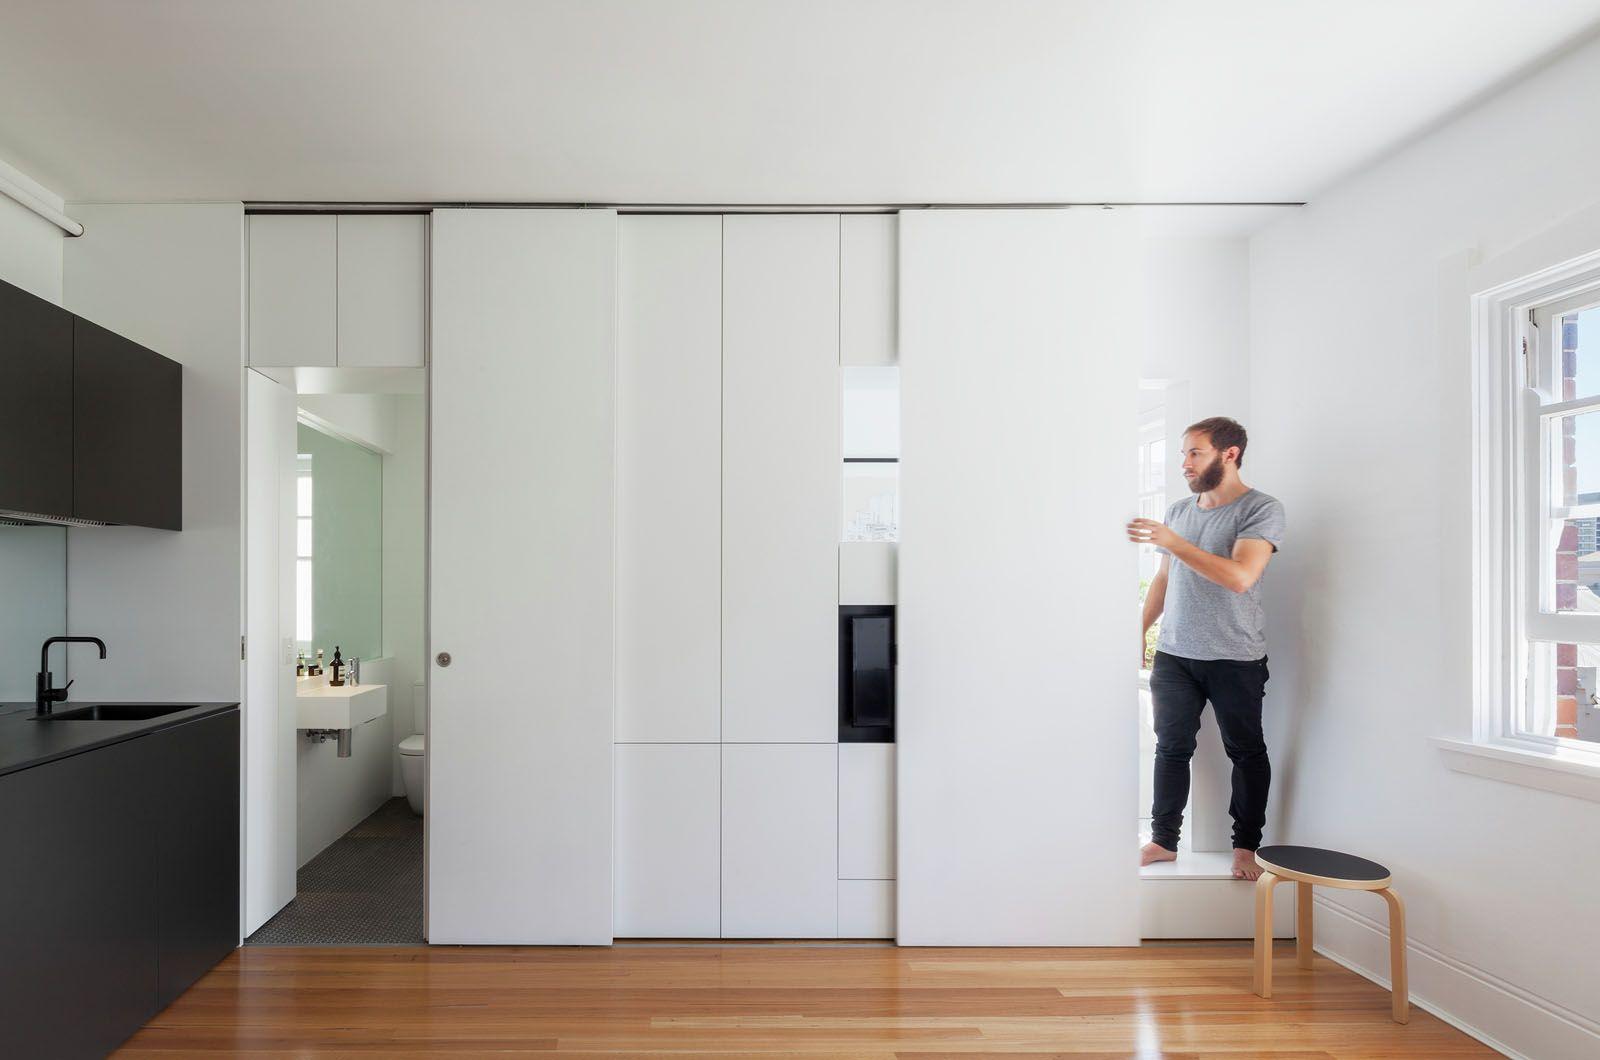 Minimalist Inner City Micro Apartment With Smart Functional Design Idesignarch Interior Design Architecture Interior Decorating Emagazine Small Apartment Design Apartment Design Small Room Design